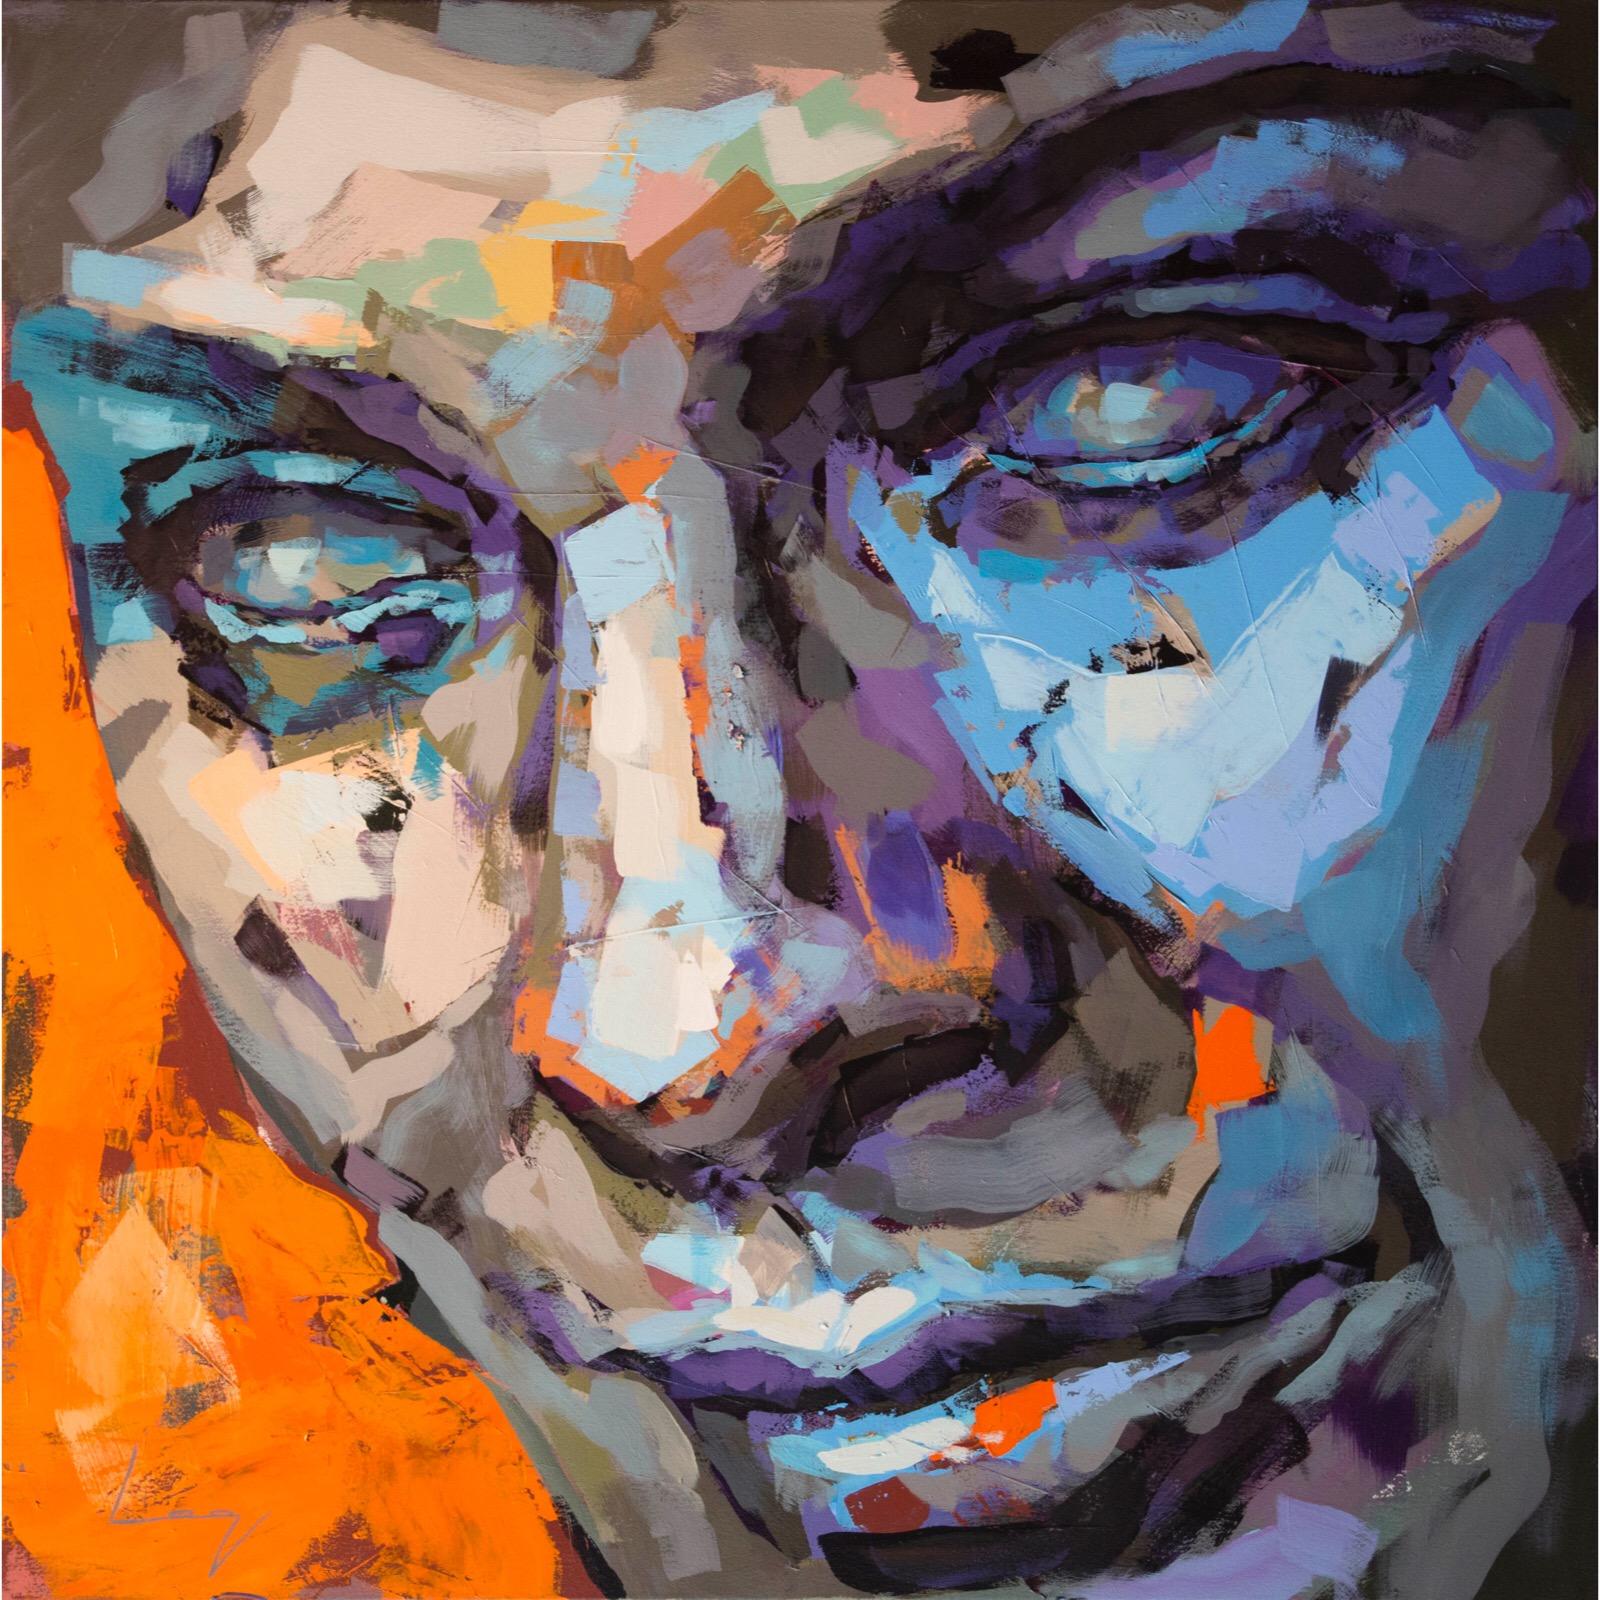 Ingrid Thulin (Smultronstället) 100x100 cm by Alberto Ramirez LEG (Bergman)